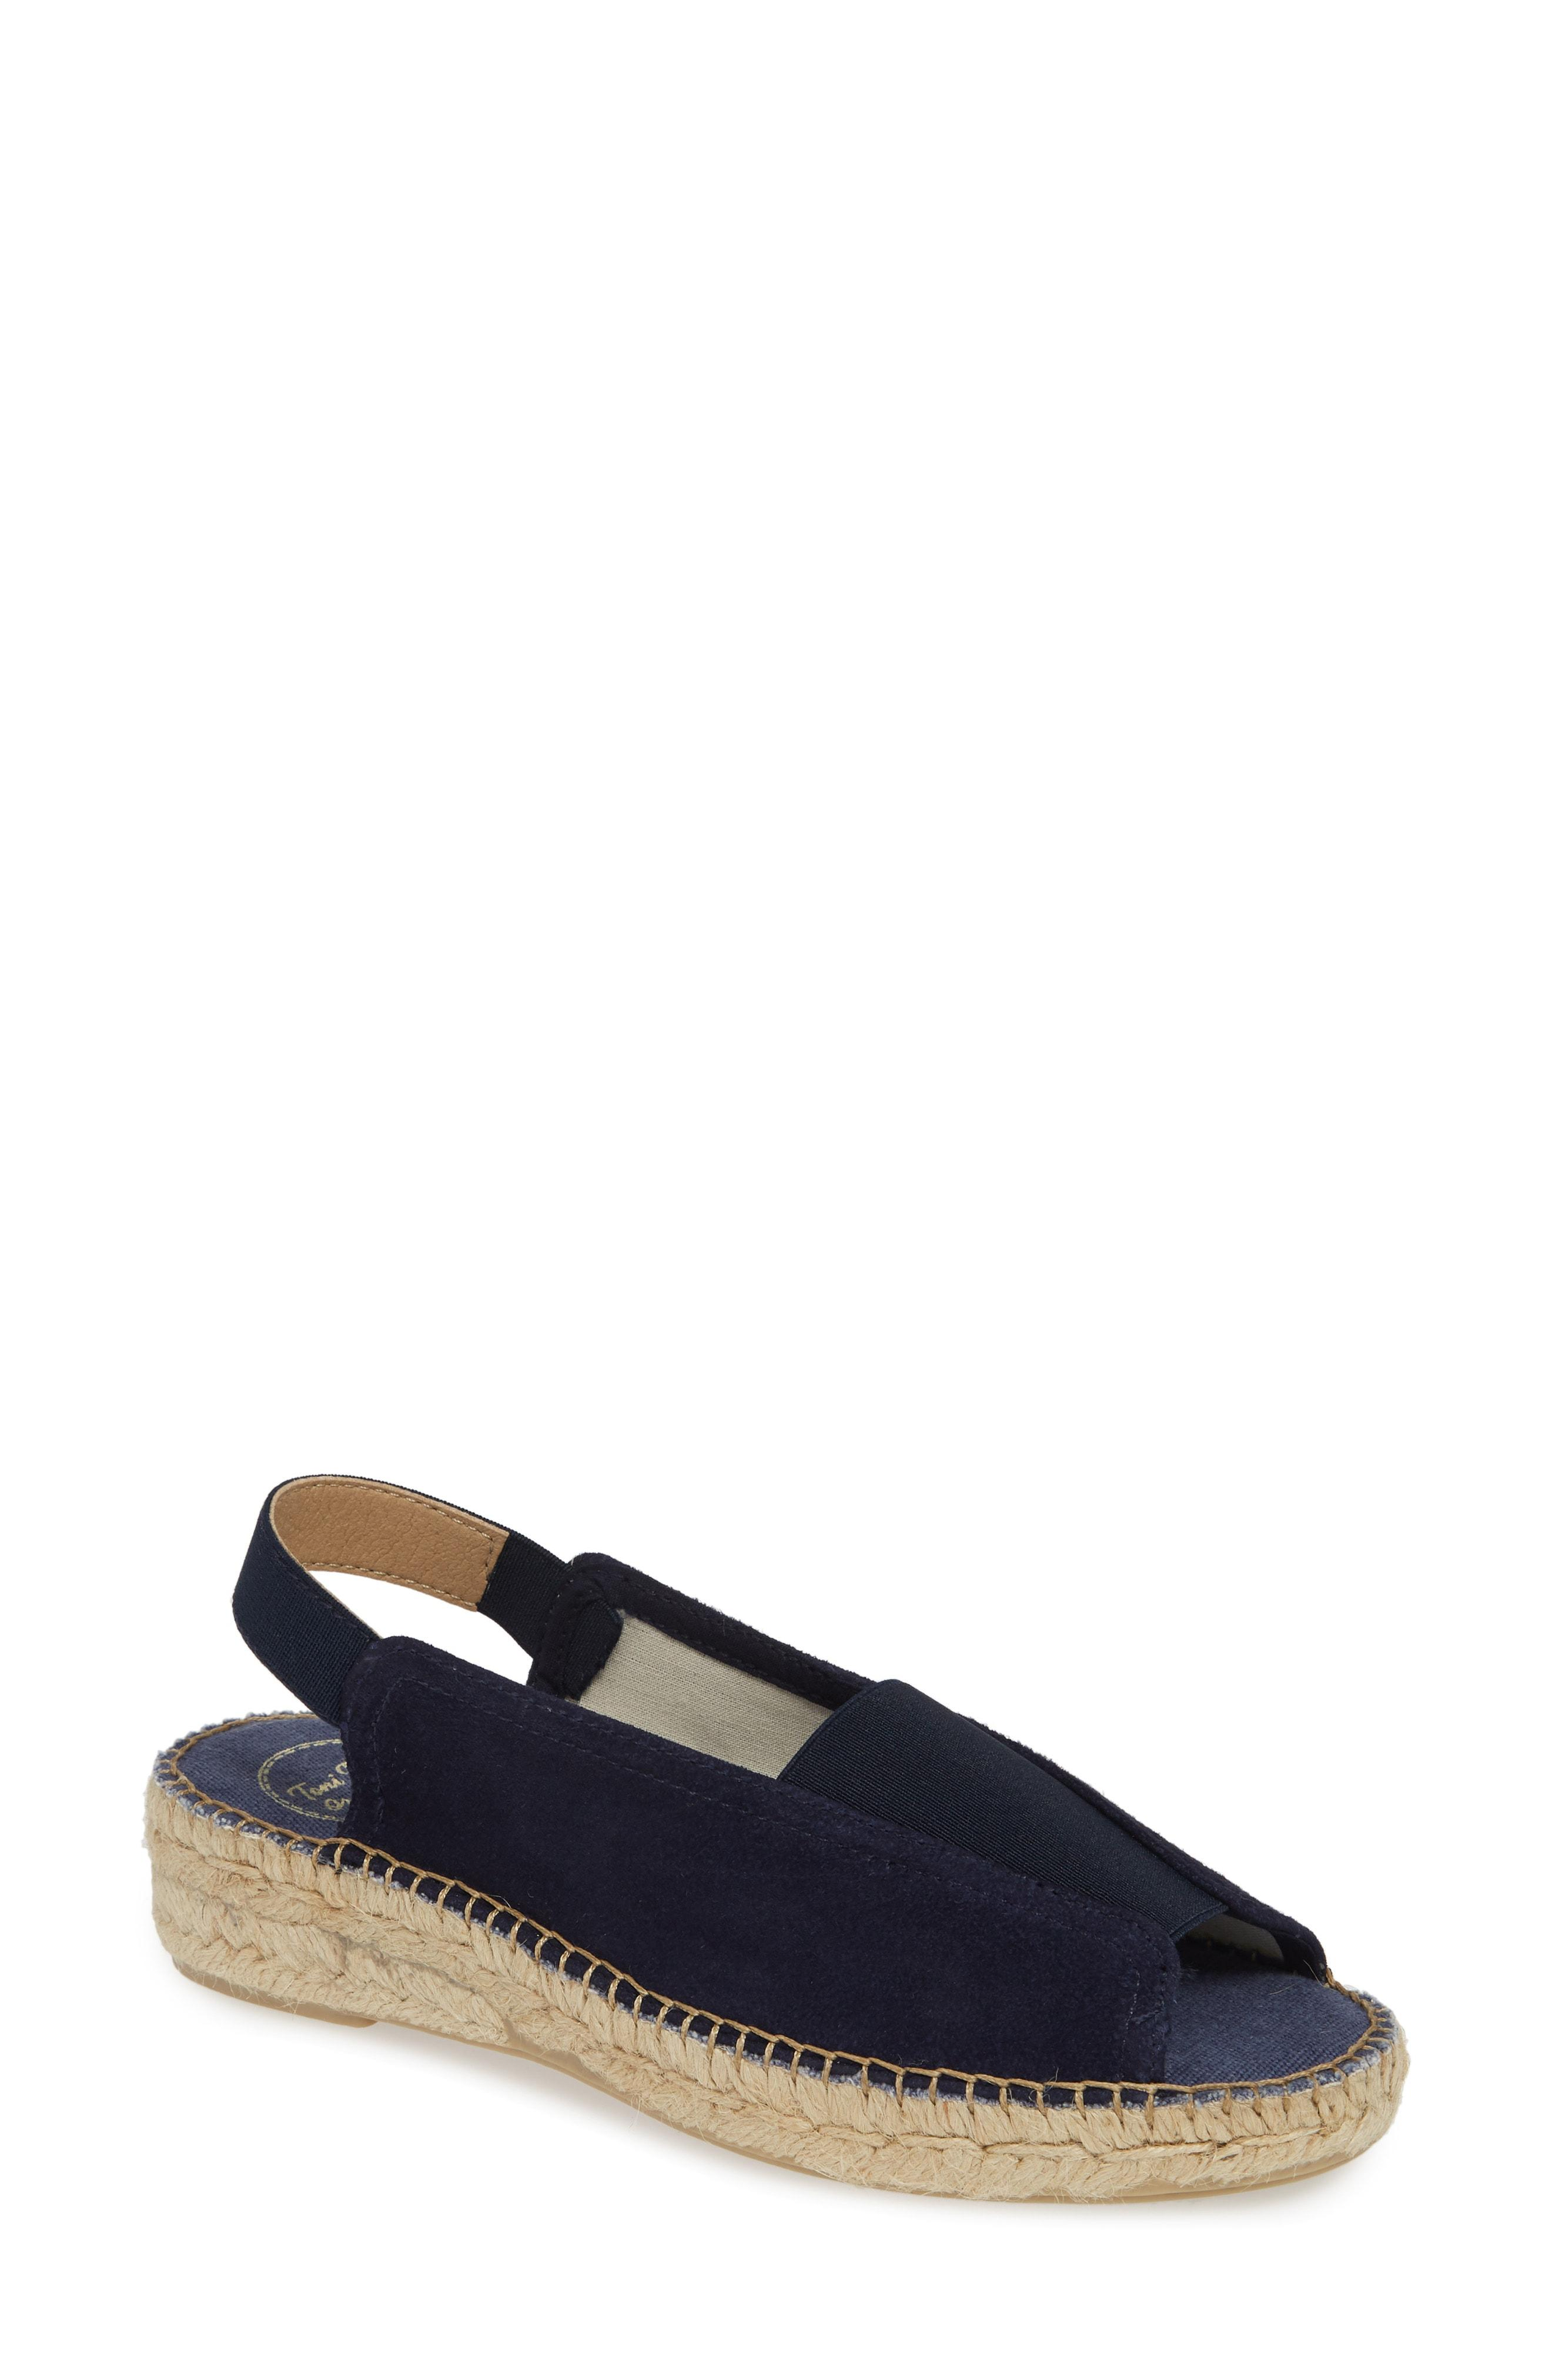 eb46ab96c05 Lyst - Toni Pons Esmy Slingback Wedge Sandal in Blue